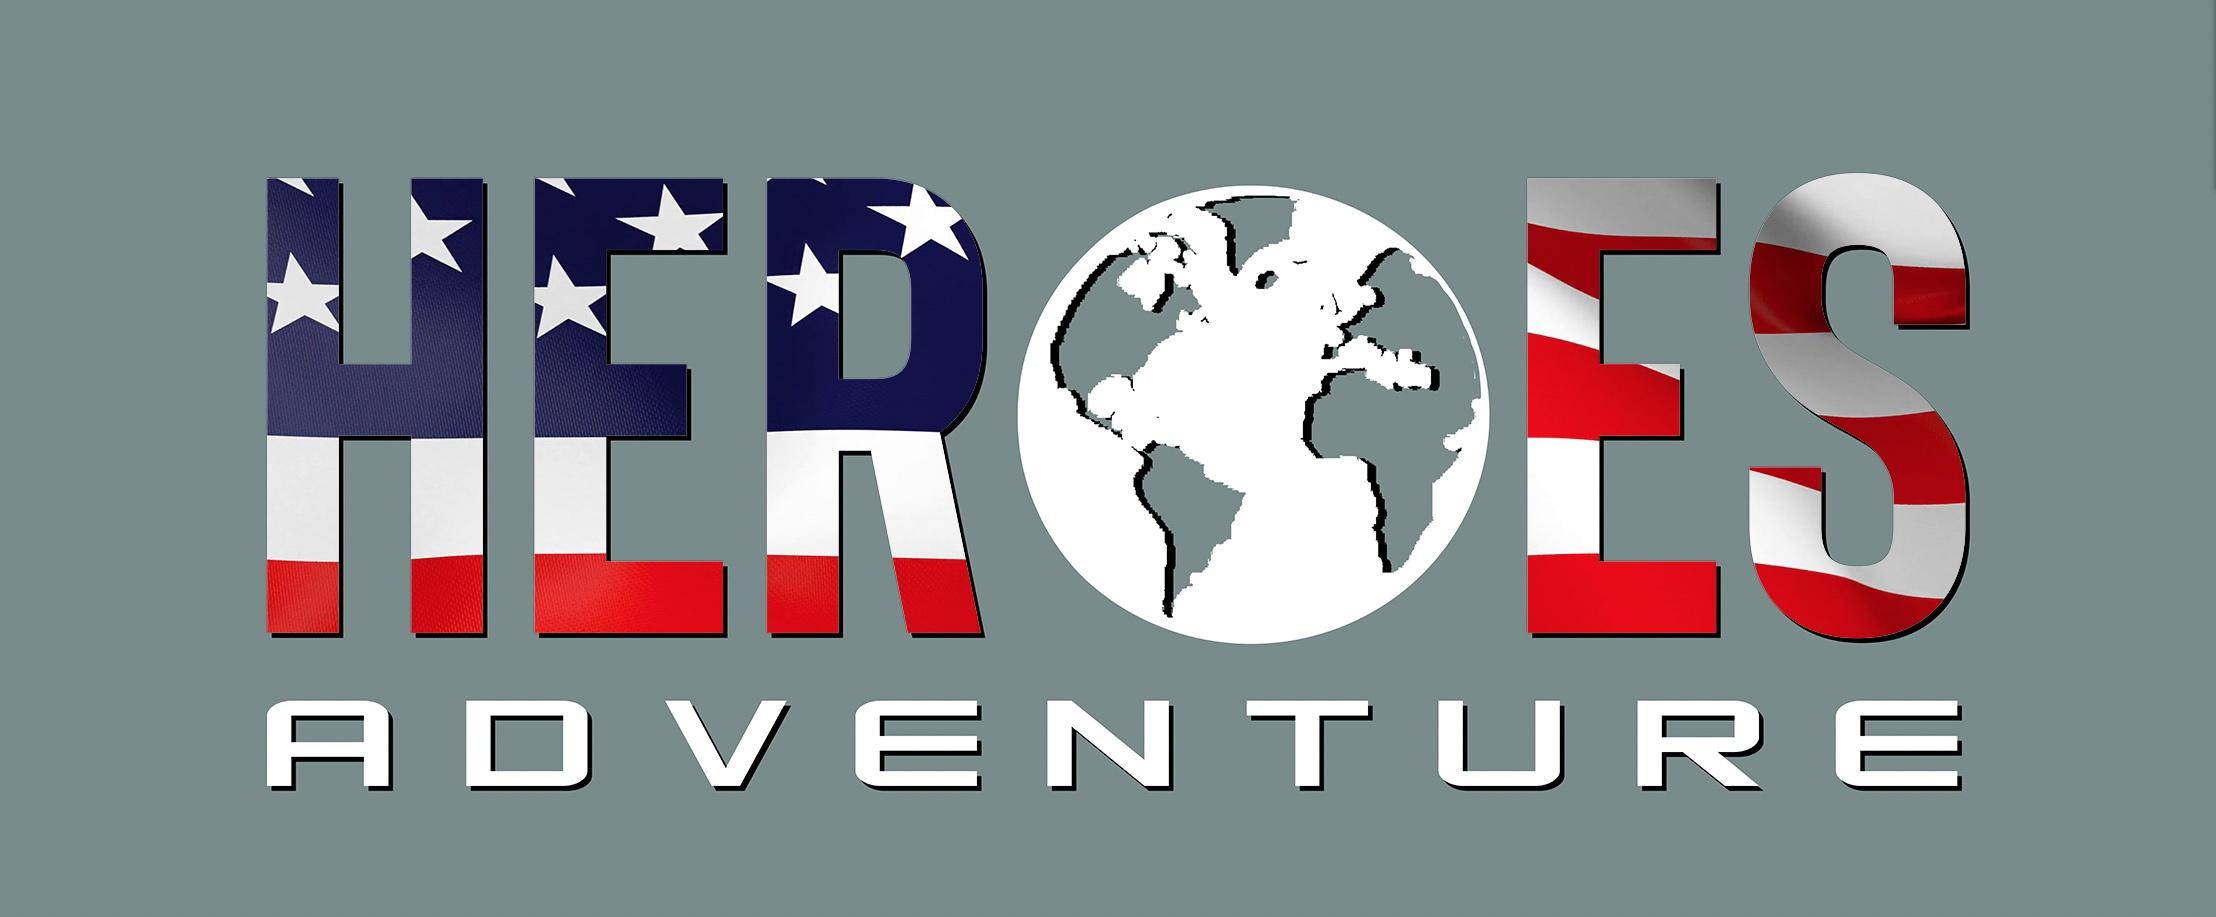 Heroes of Adventure USA Adventure Challenge